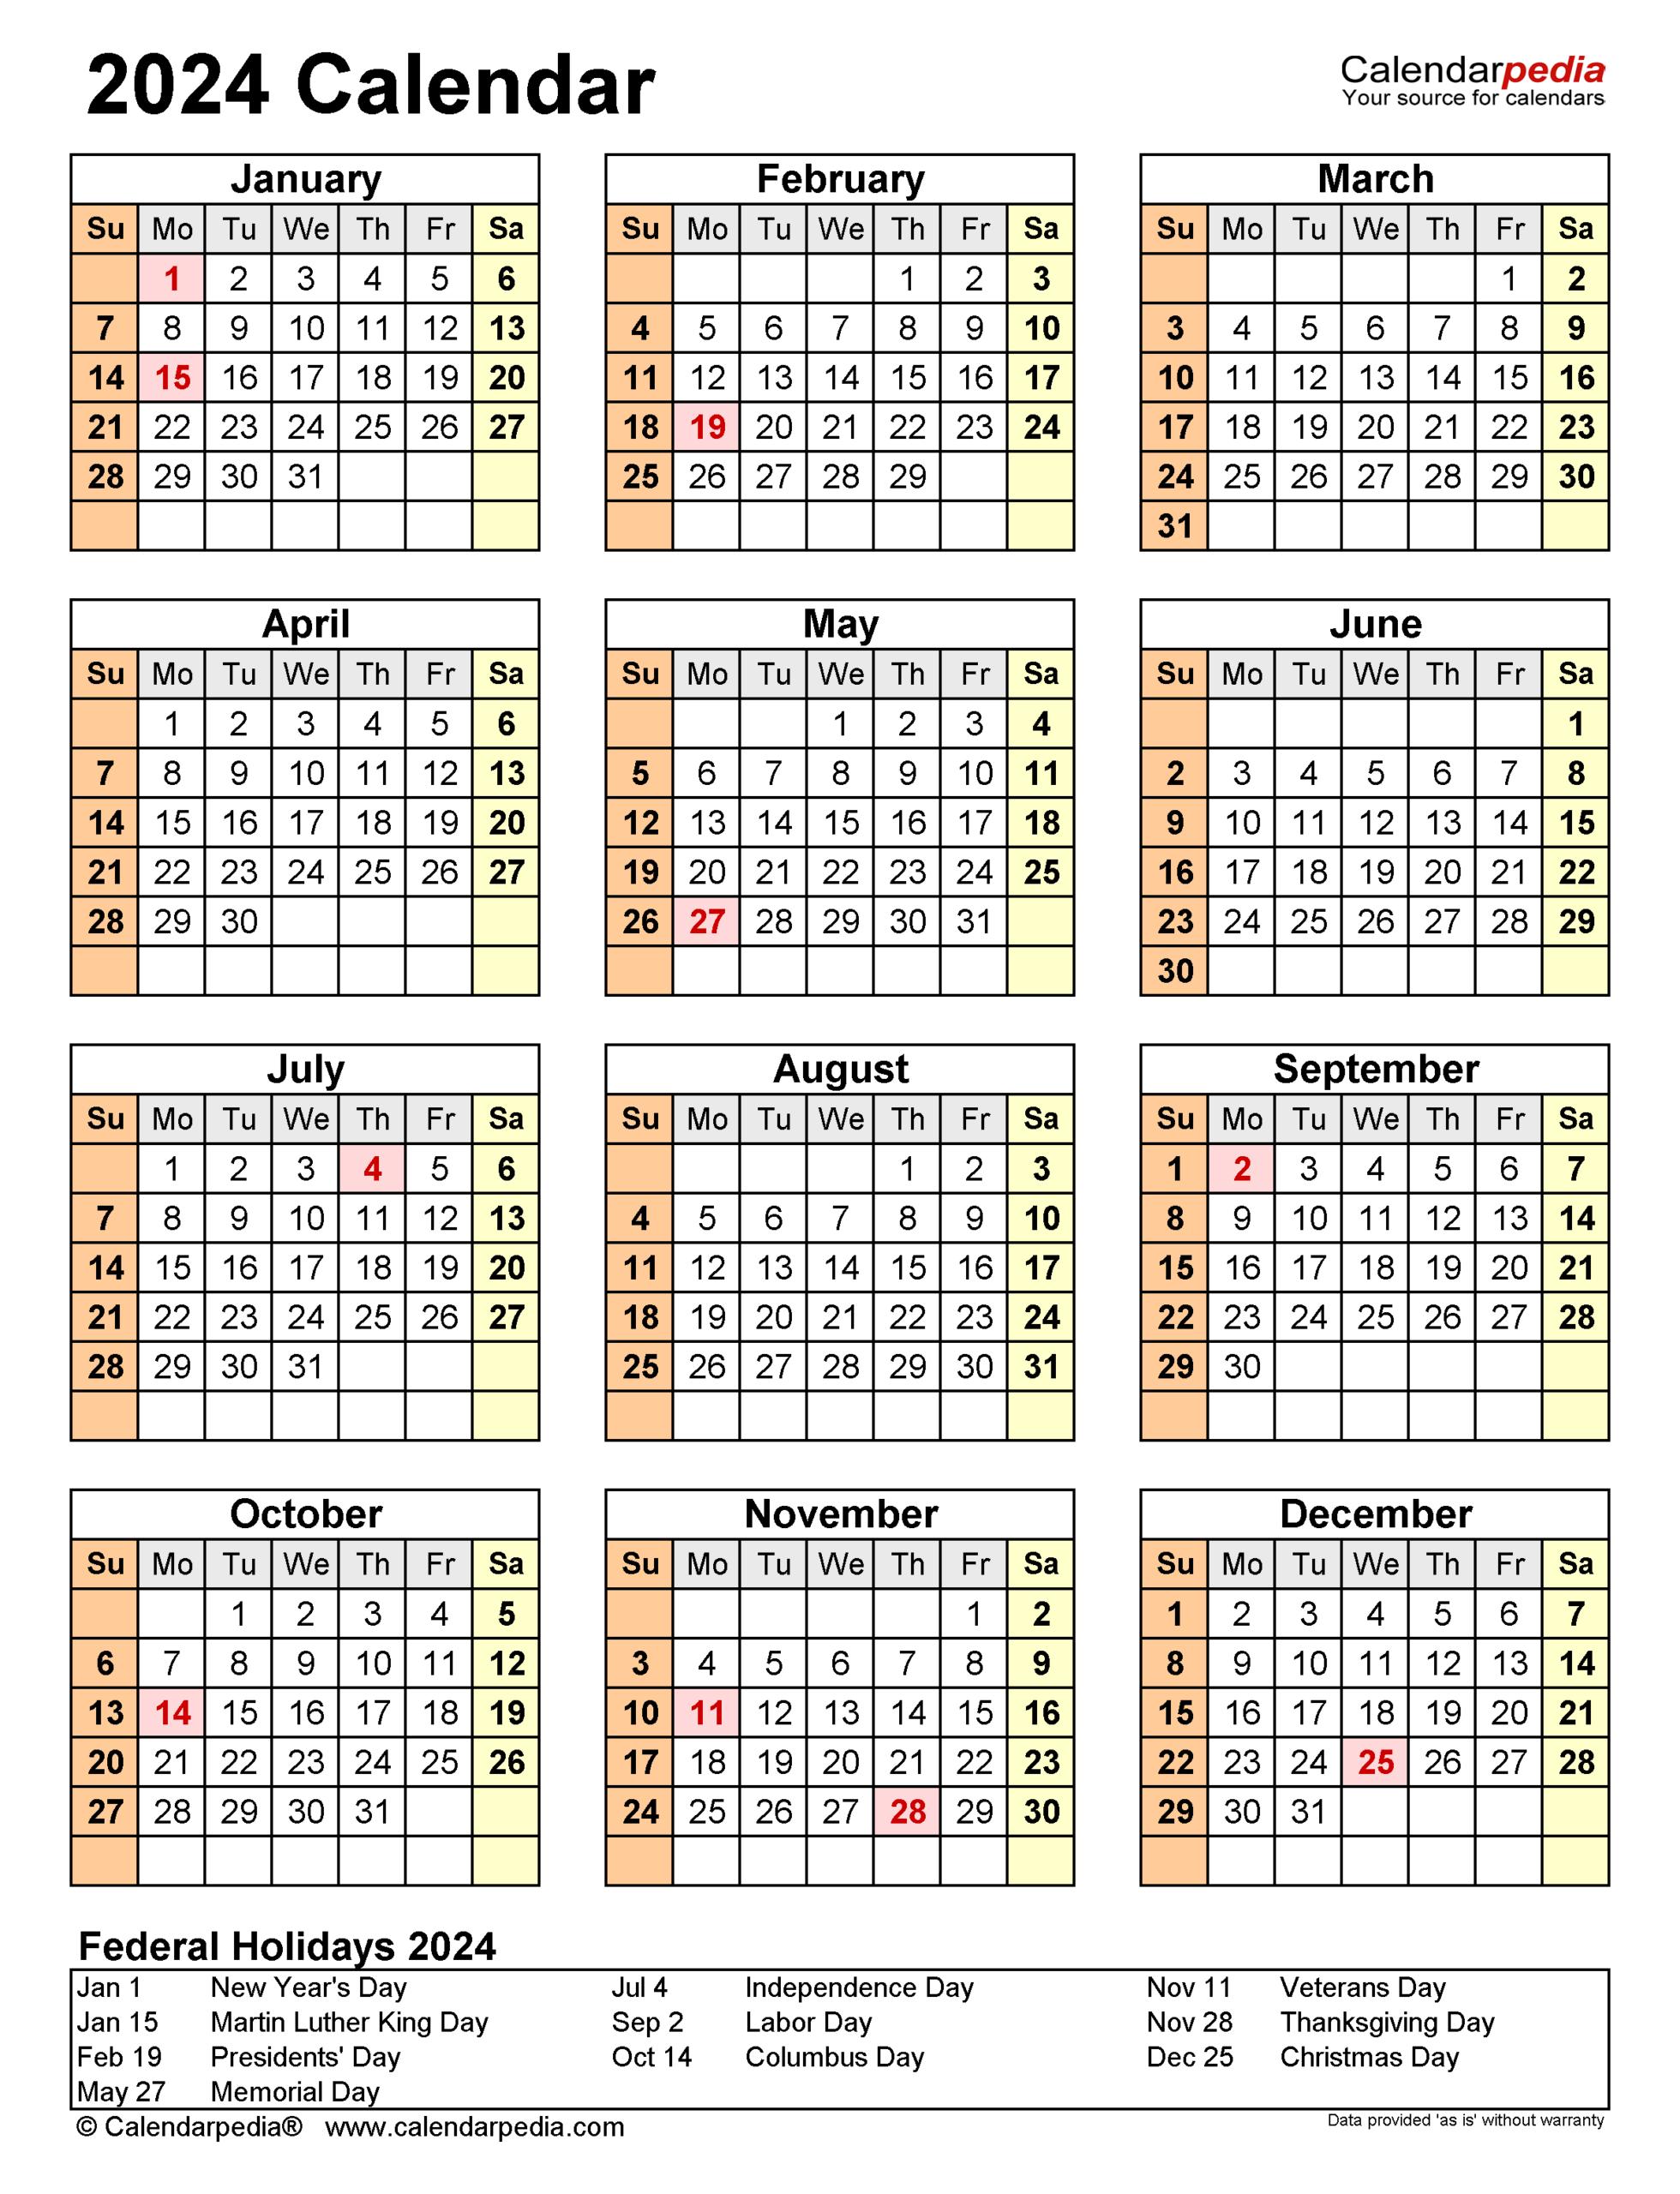 2024 Calendar  Free Printable Pdf Templates  Calendarpedia with regard to Federal Holidays 2025